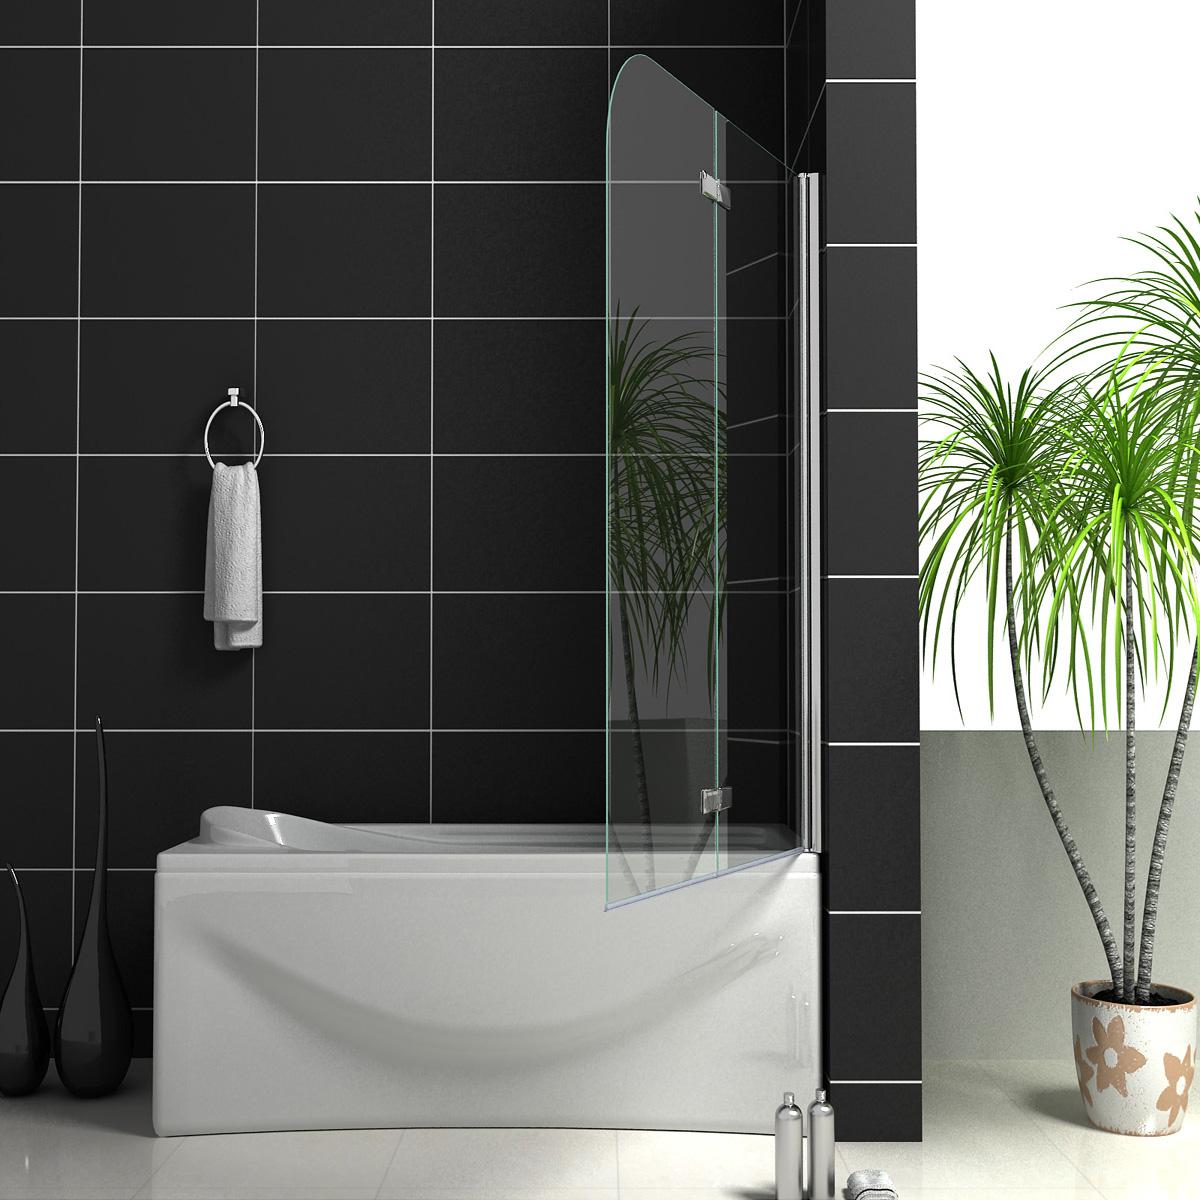 100 shower screen for baths shower screen stock photos shower screen for baths aica 180 pivot 2 fold folding hinge shower bath screen 6mm